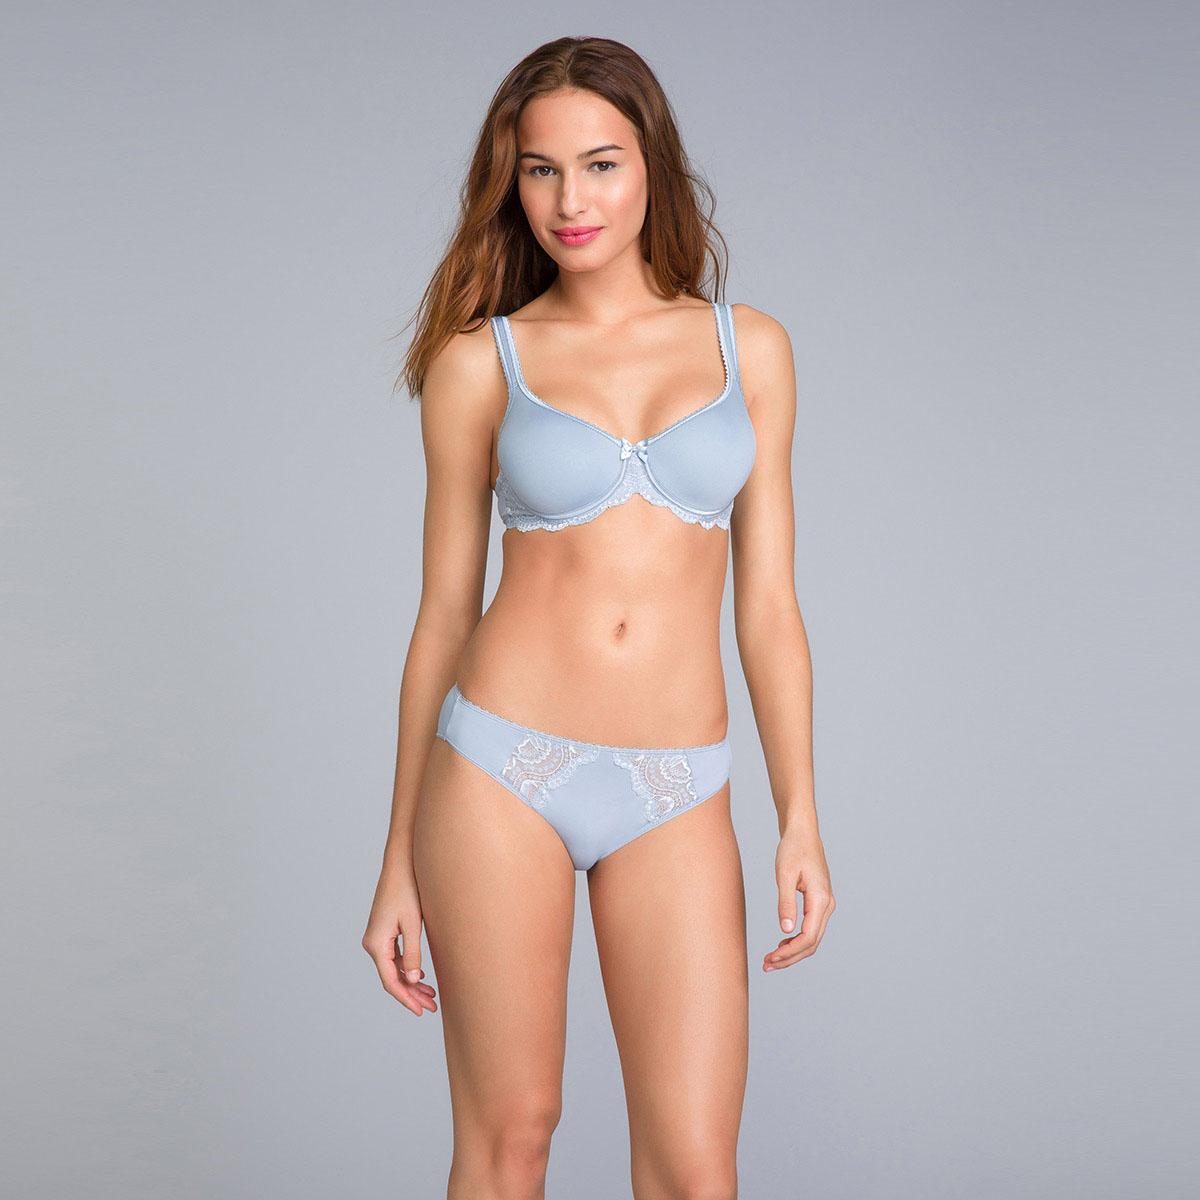 Bikini Knickers in Blue Fog Lace - Flower Elegance - PLAYTEX